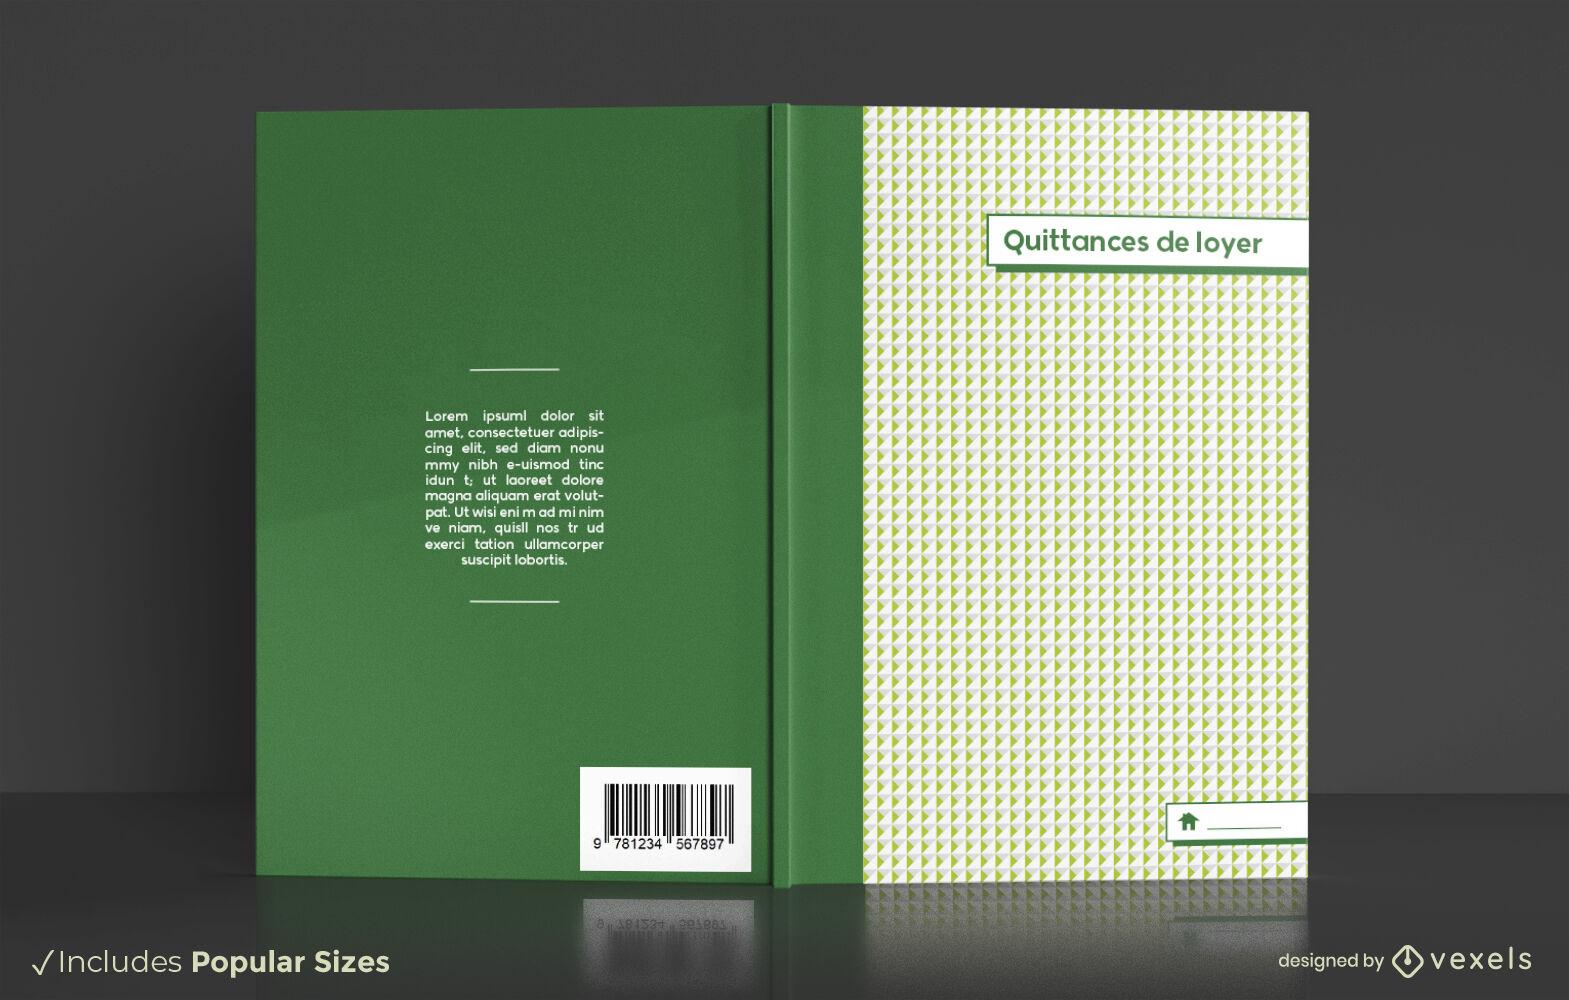 Diseño de portada de libro organizador de recibos de alquiler